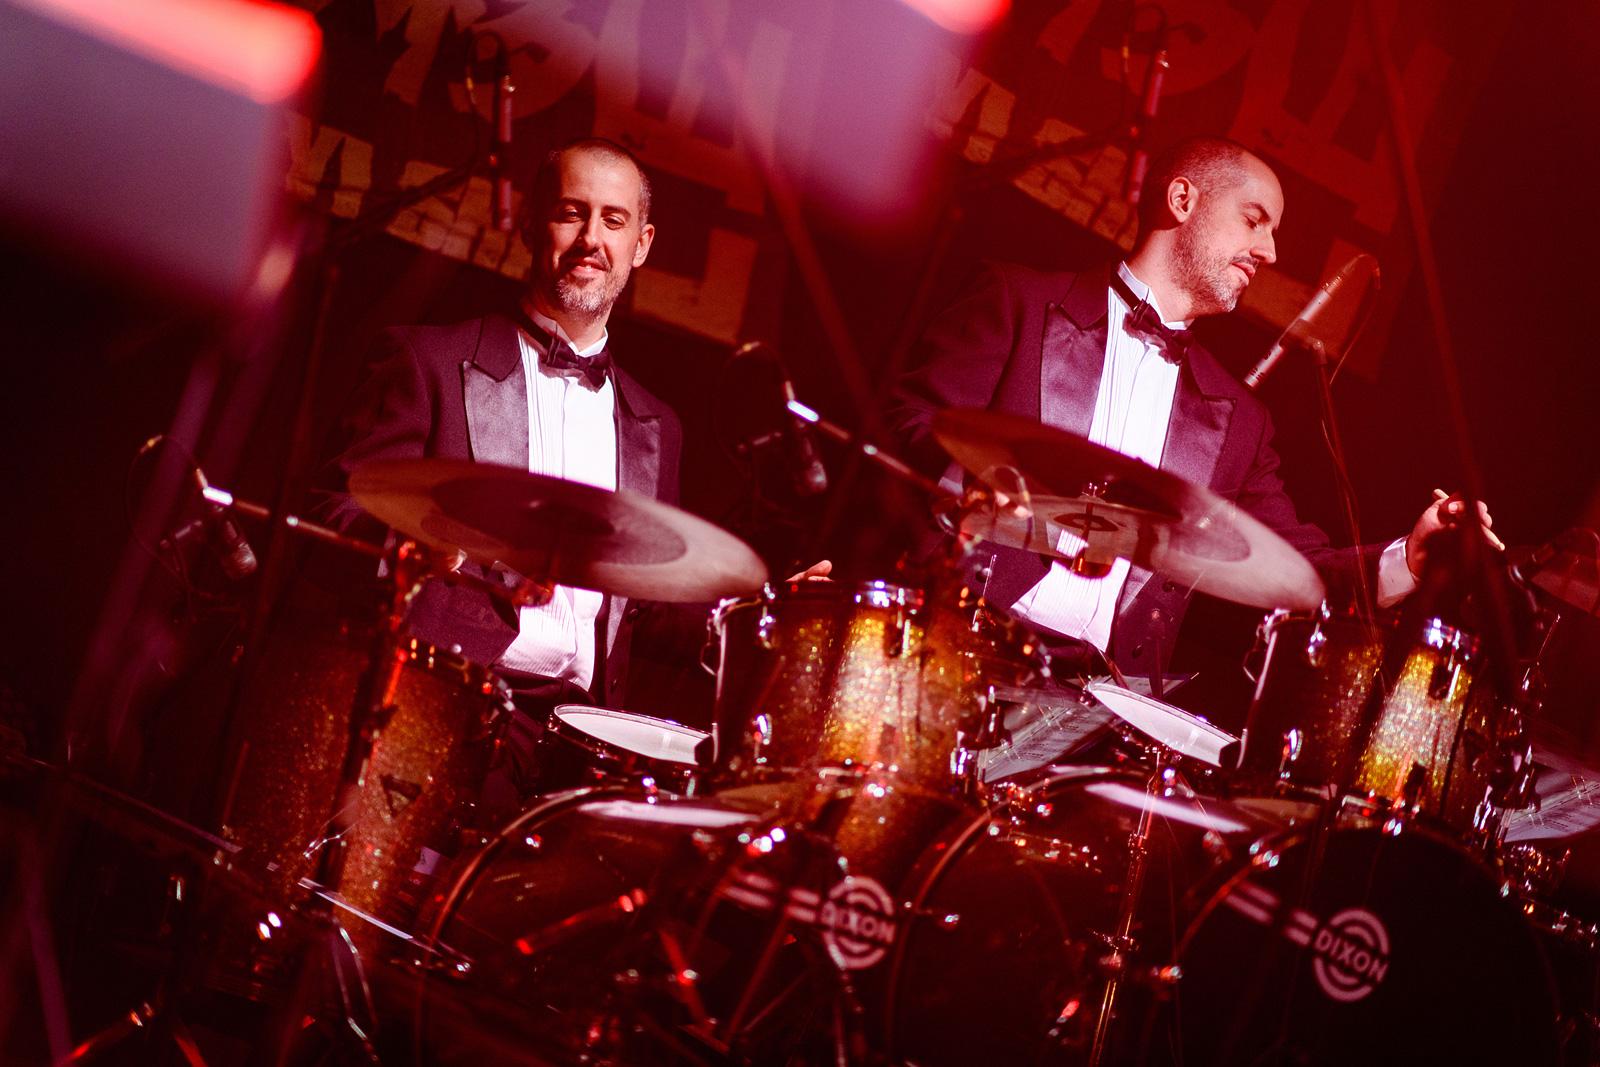 Diego Gil na bateria